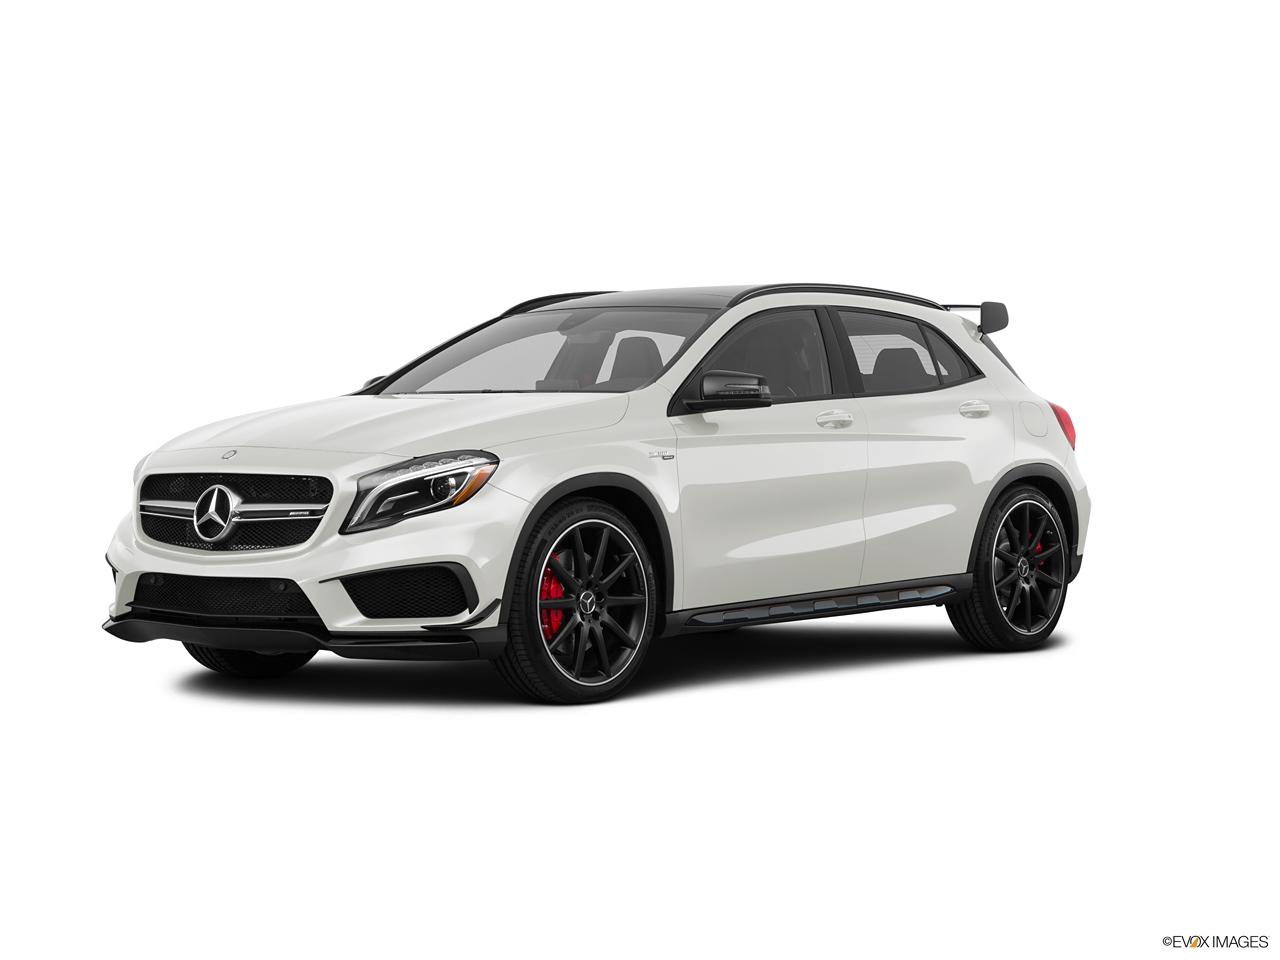 Mercedes benz gla 2016 45 amg in uae new car prices for Mercedes benz gla prices